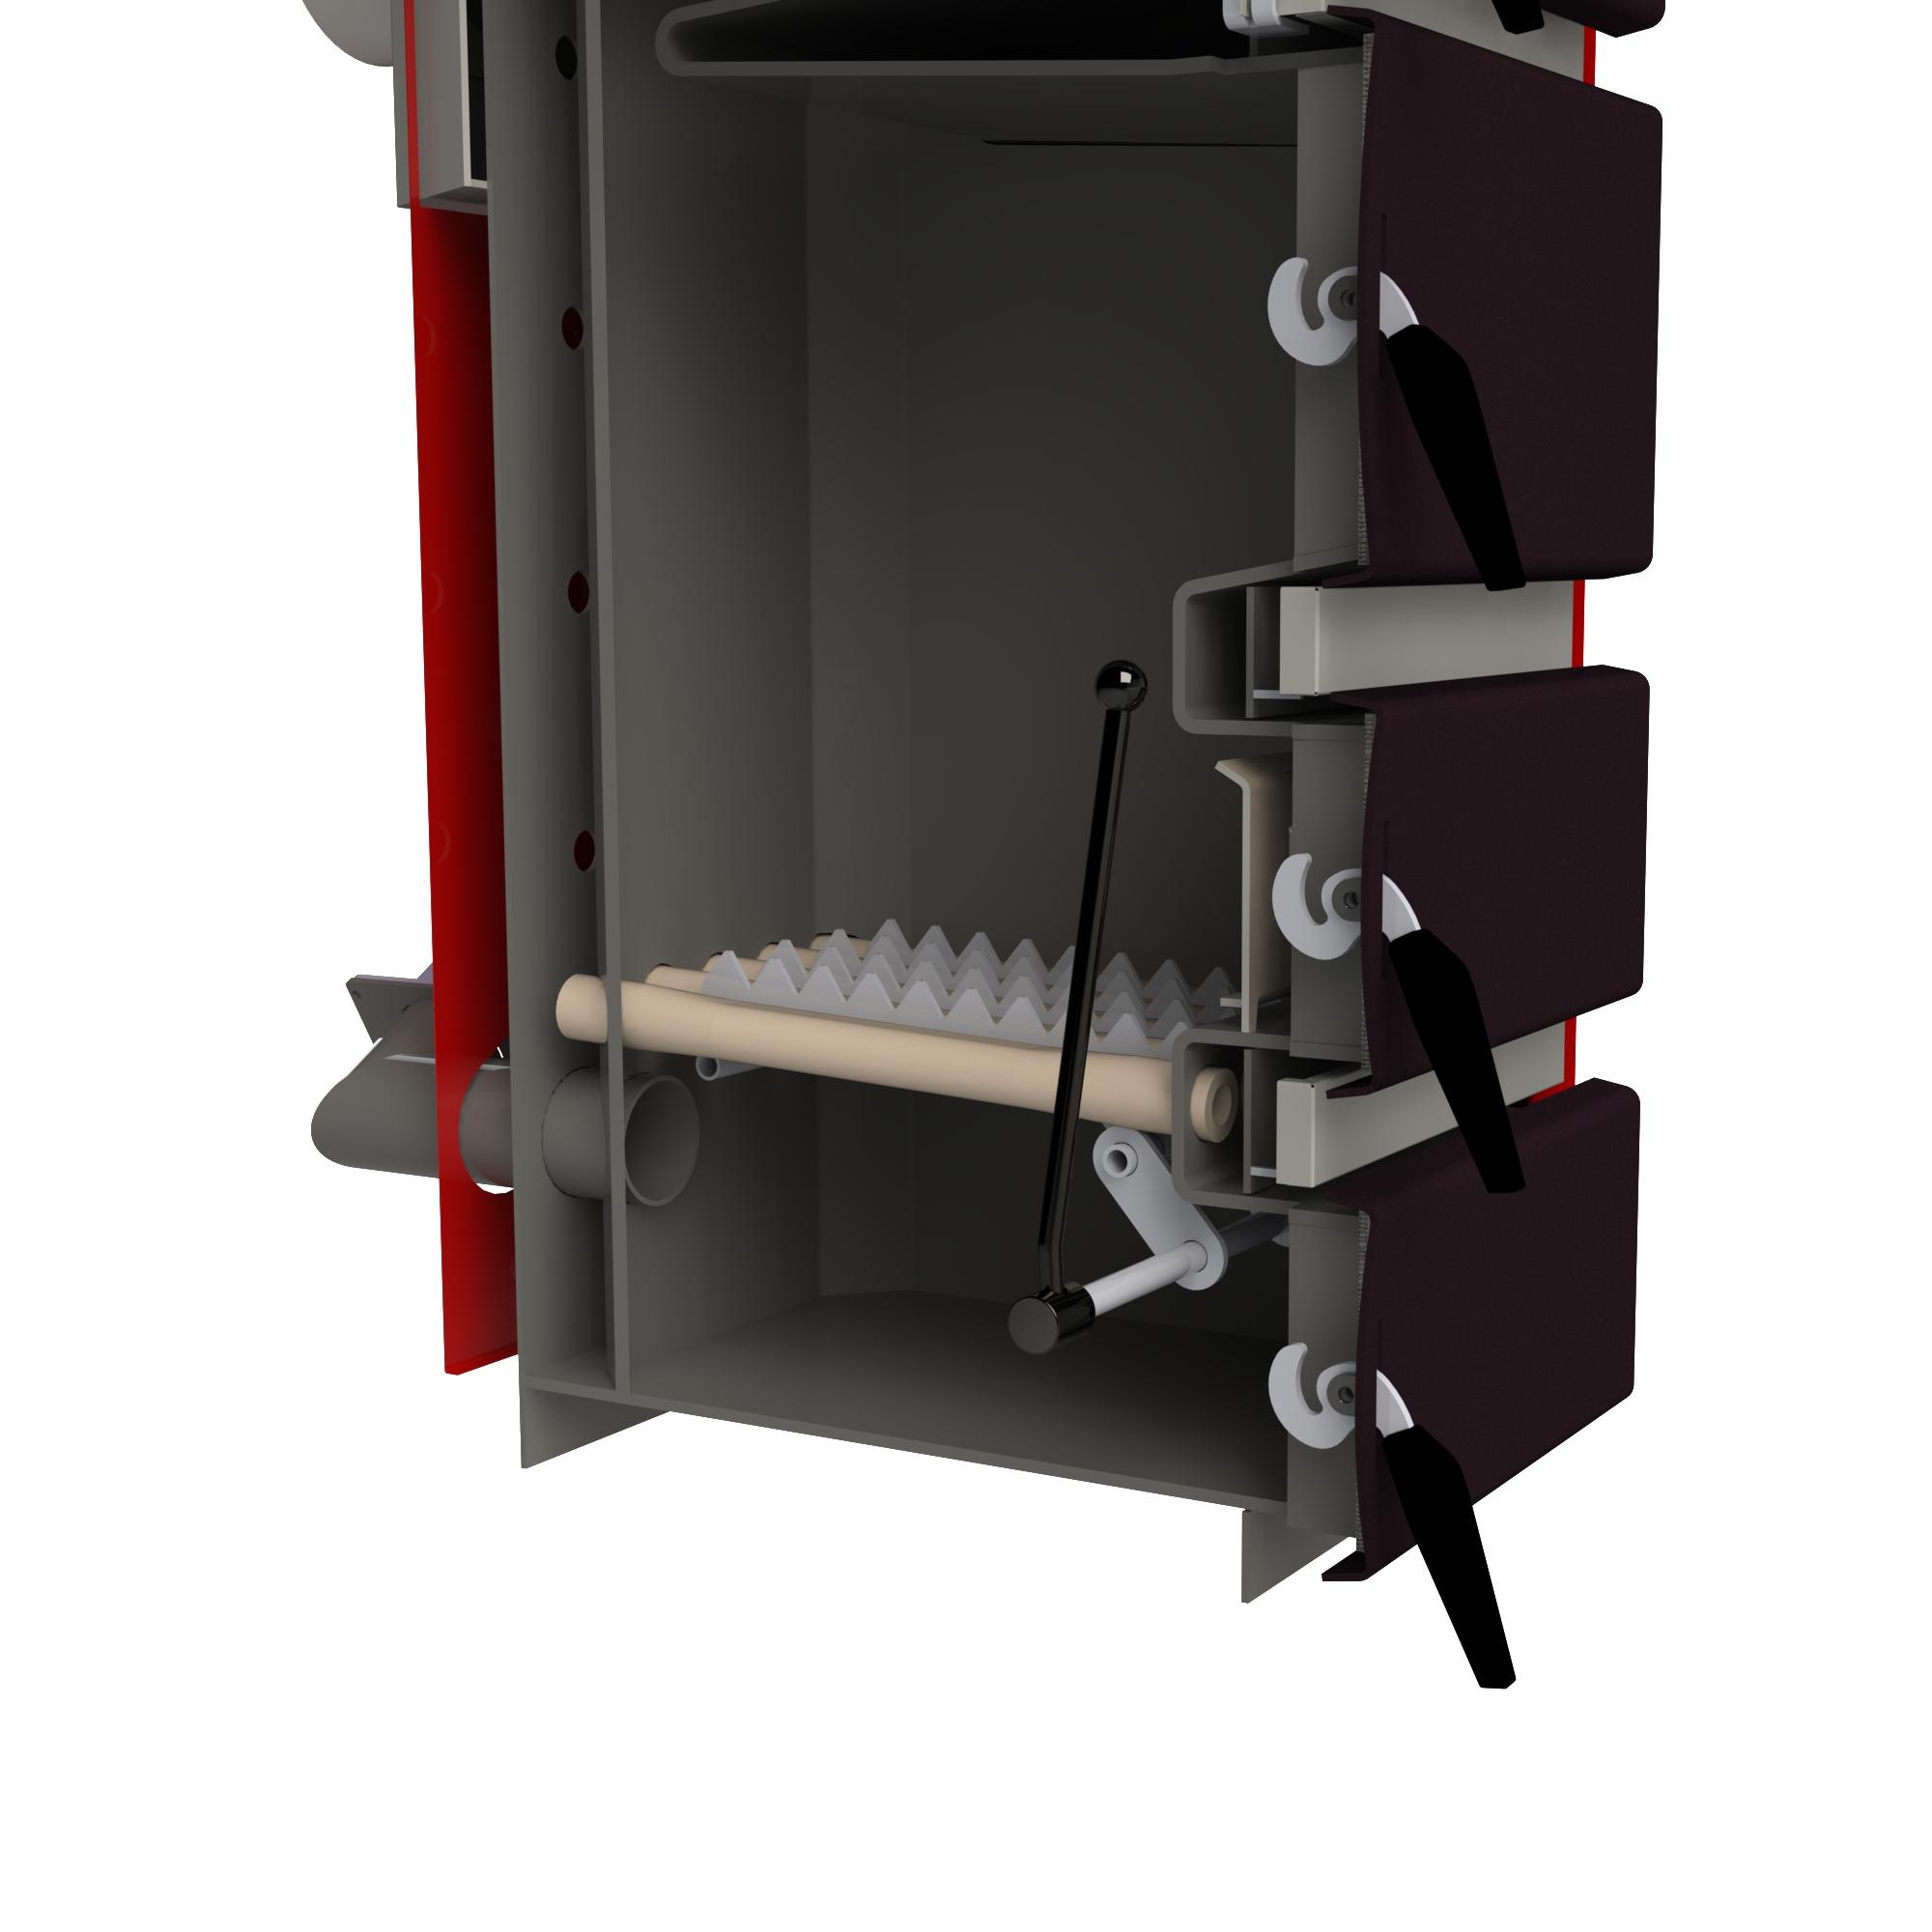 Твердотопливный котел Elektromet EKO-KWW Strong 18 фото3